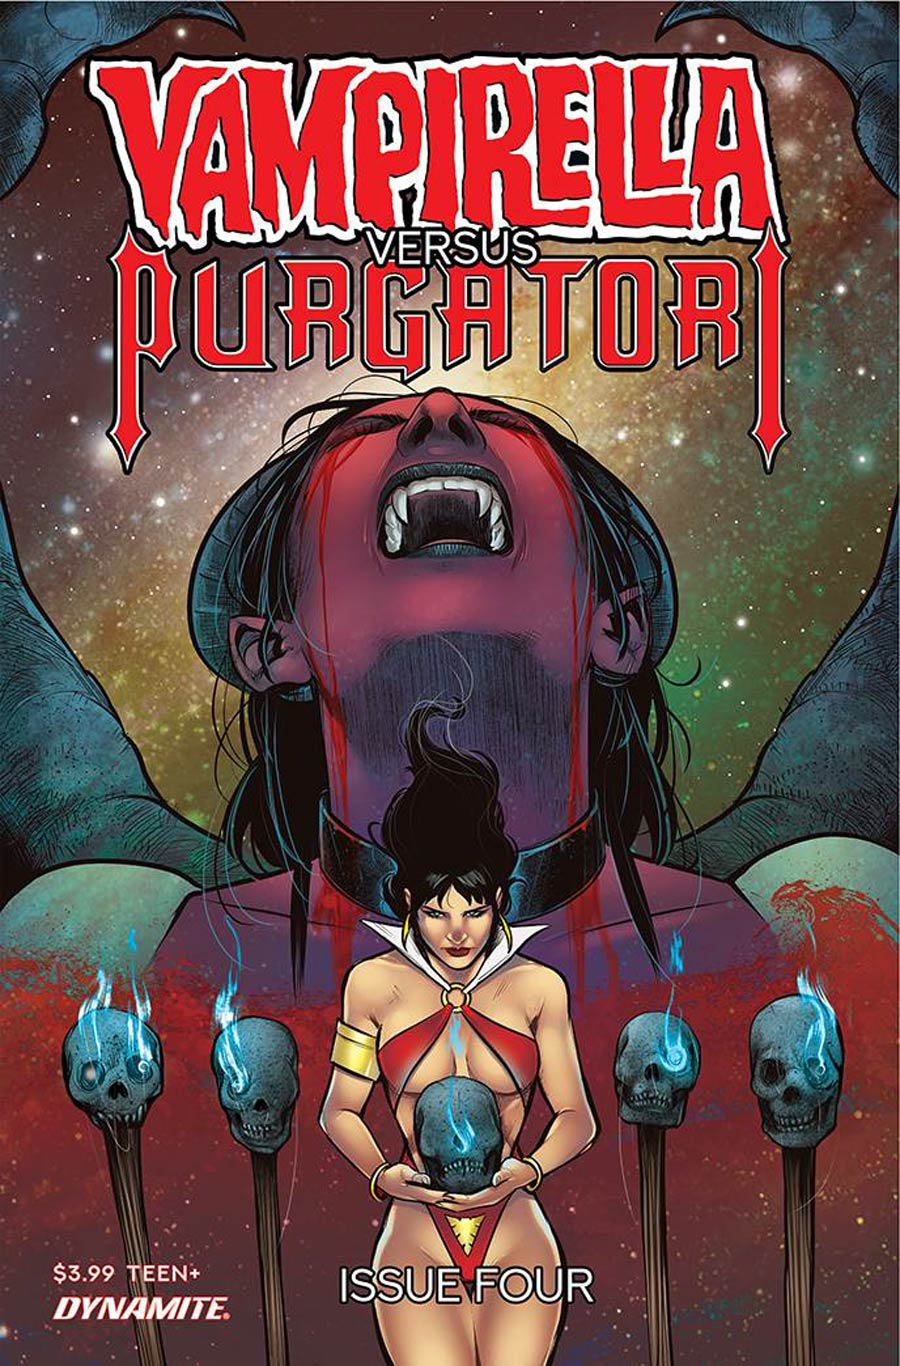 Vampirella vs Purgatori #4 Cover F Variant Alvaro Sarraseca Premium Cover